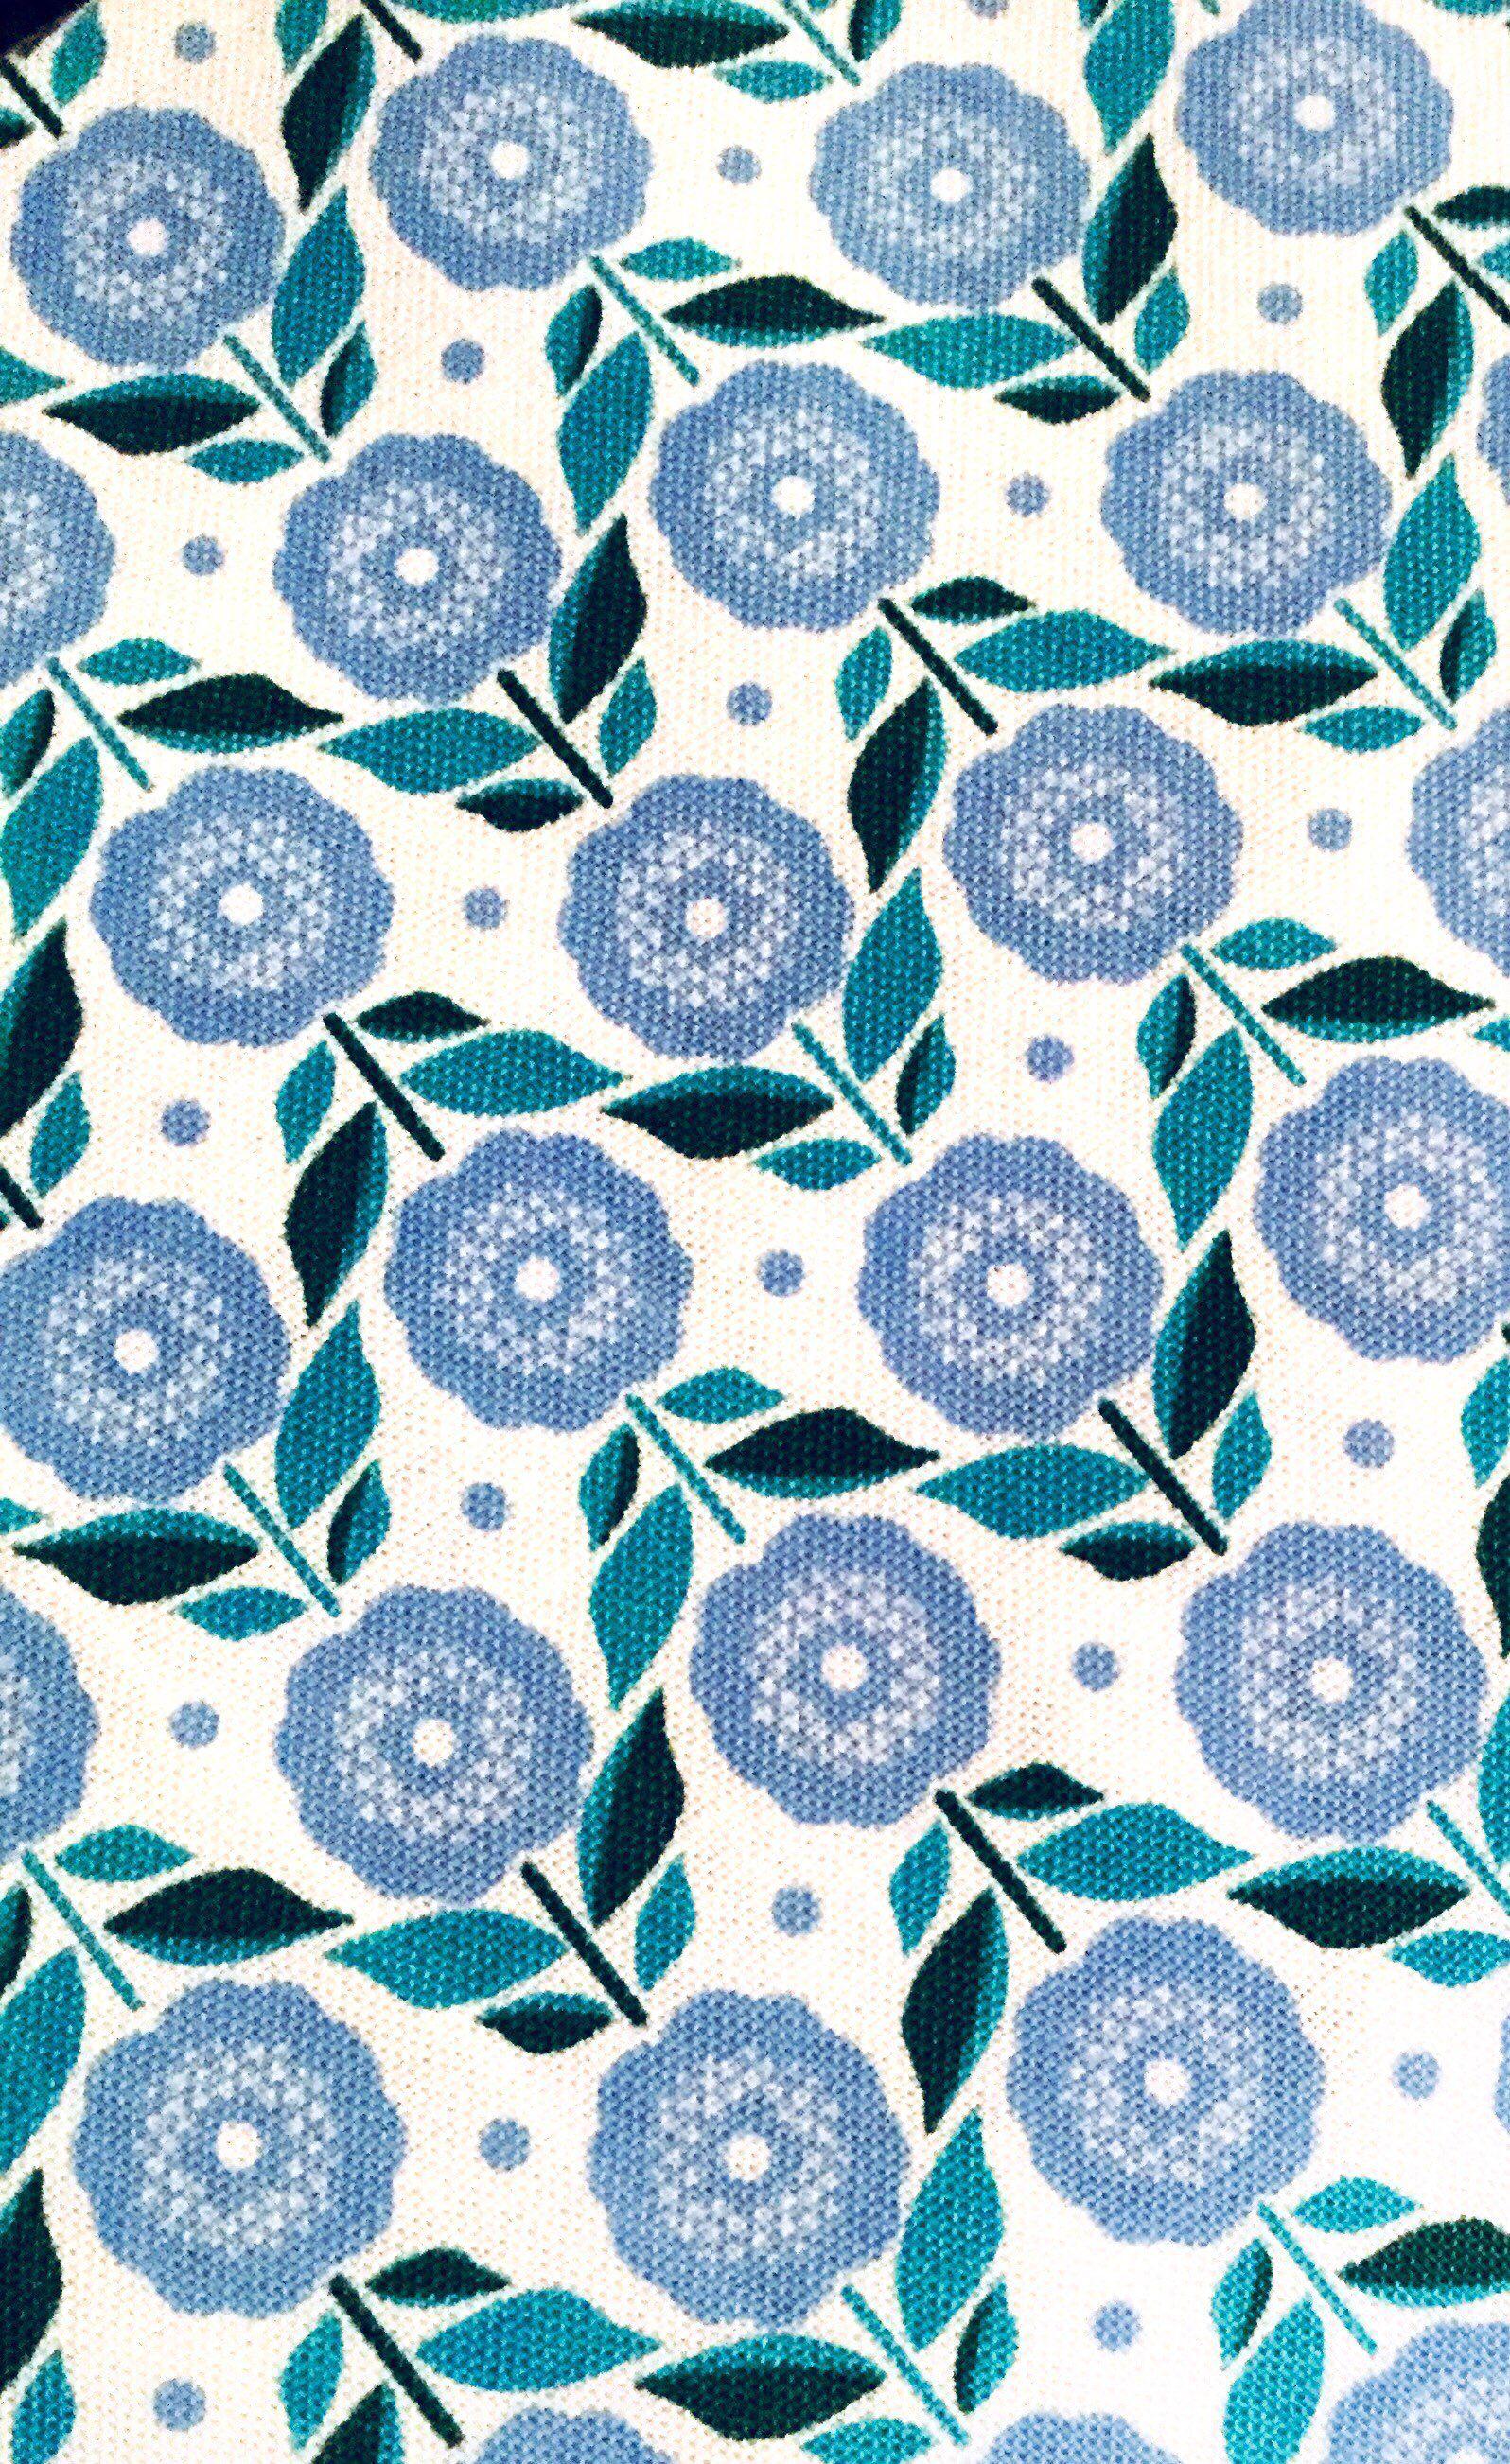 Swedish Fabric Mod Designer Fabric Scandi Floral Print Etsy Scandi Art Scandinavian Textiles Surface Pattern Design